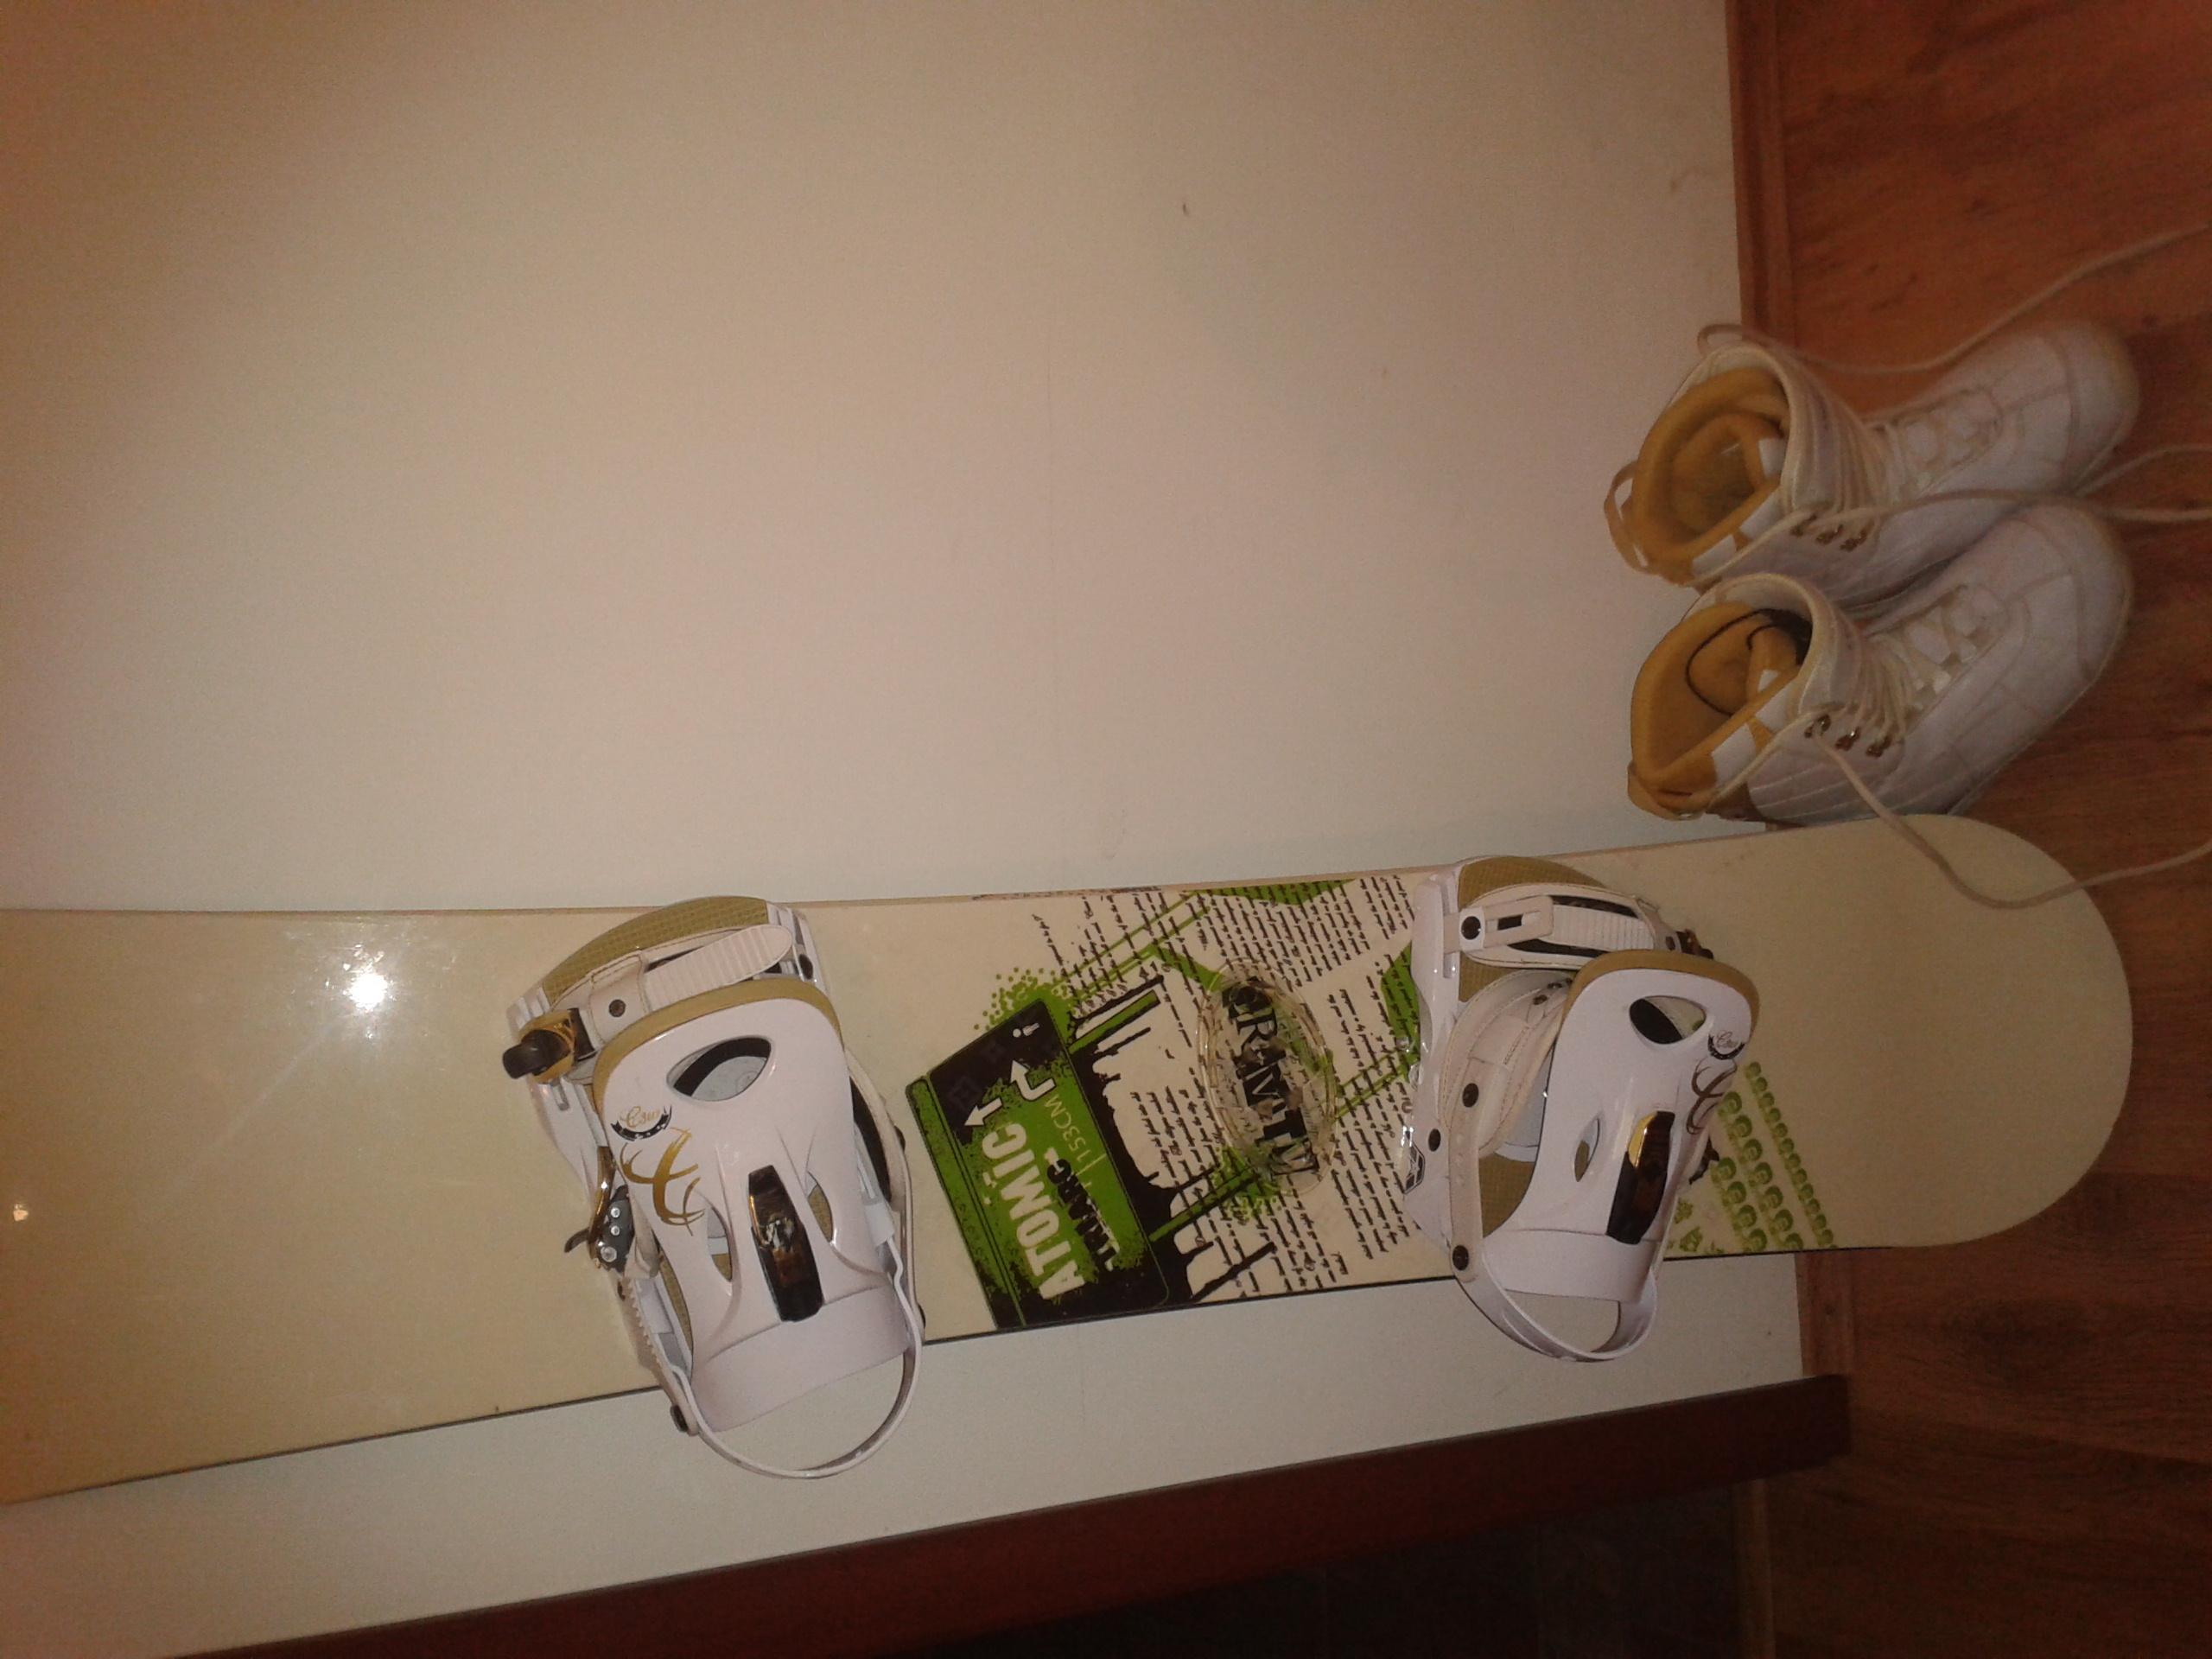 Snowboard+boty+vázání - Bazar - SNOW.CZ d4a013cc87